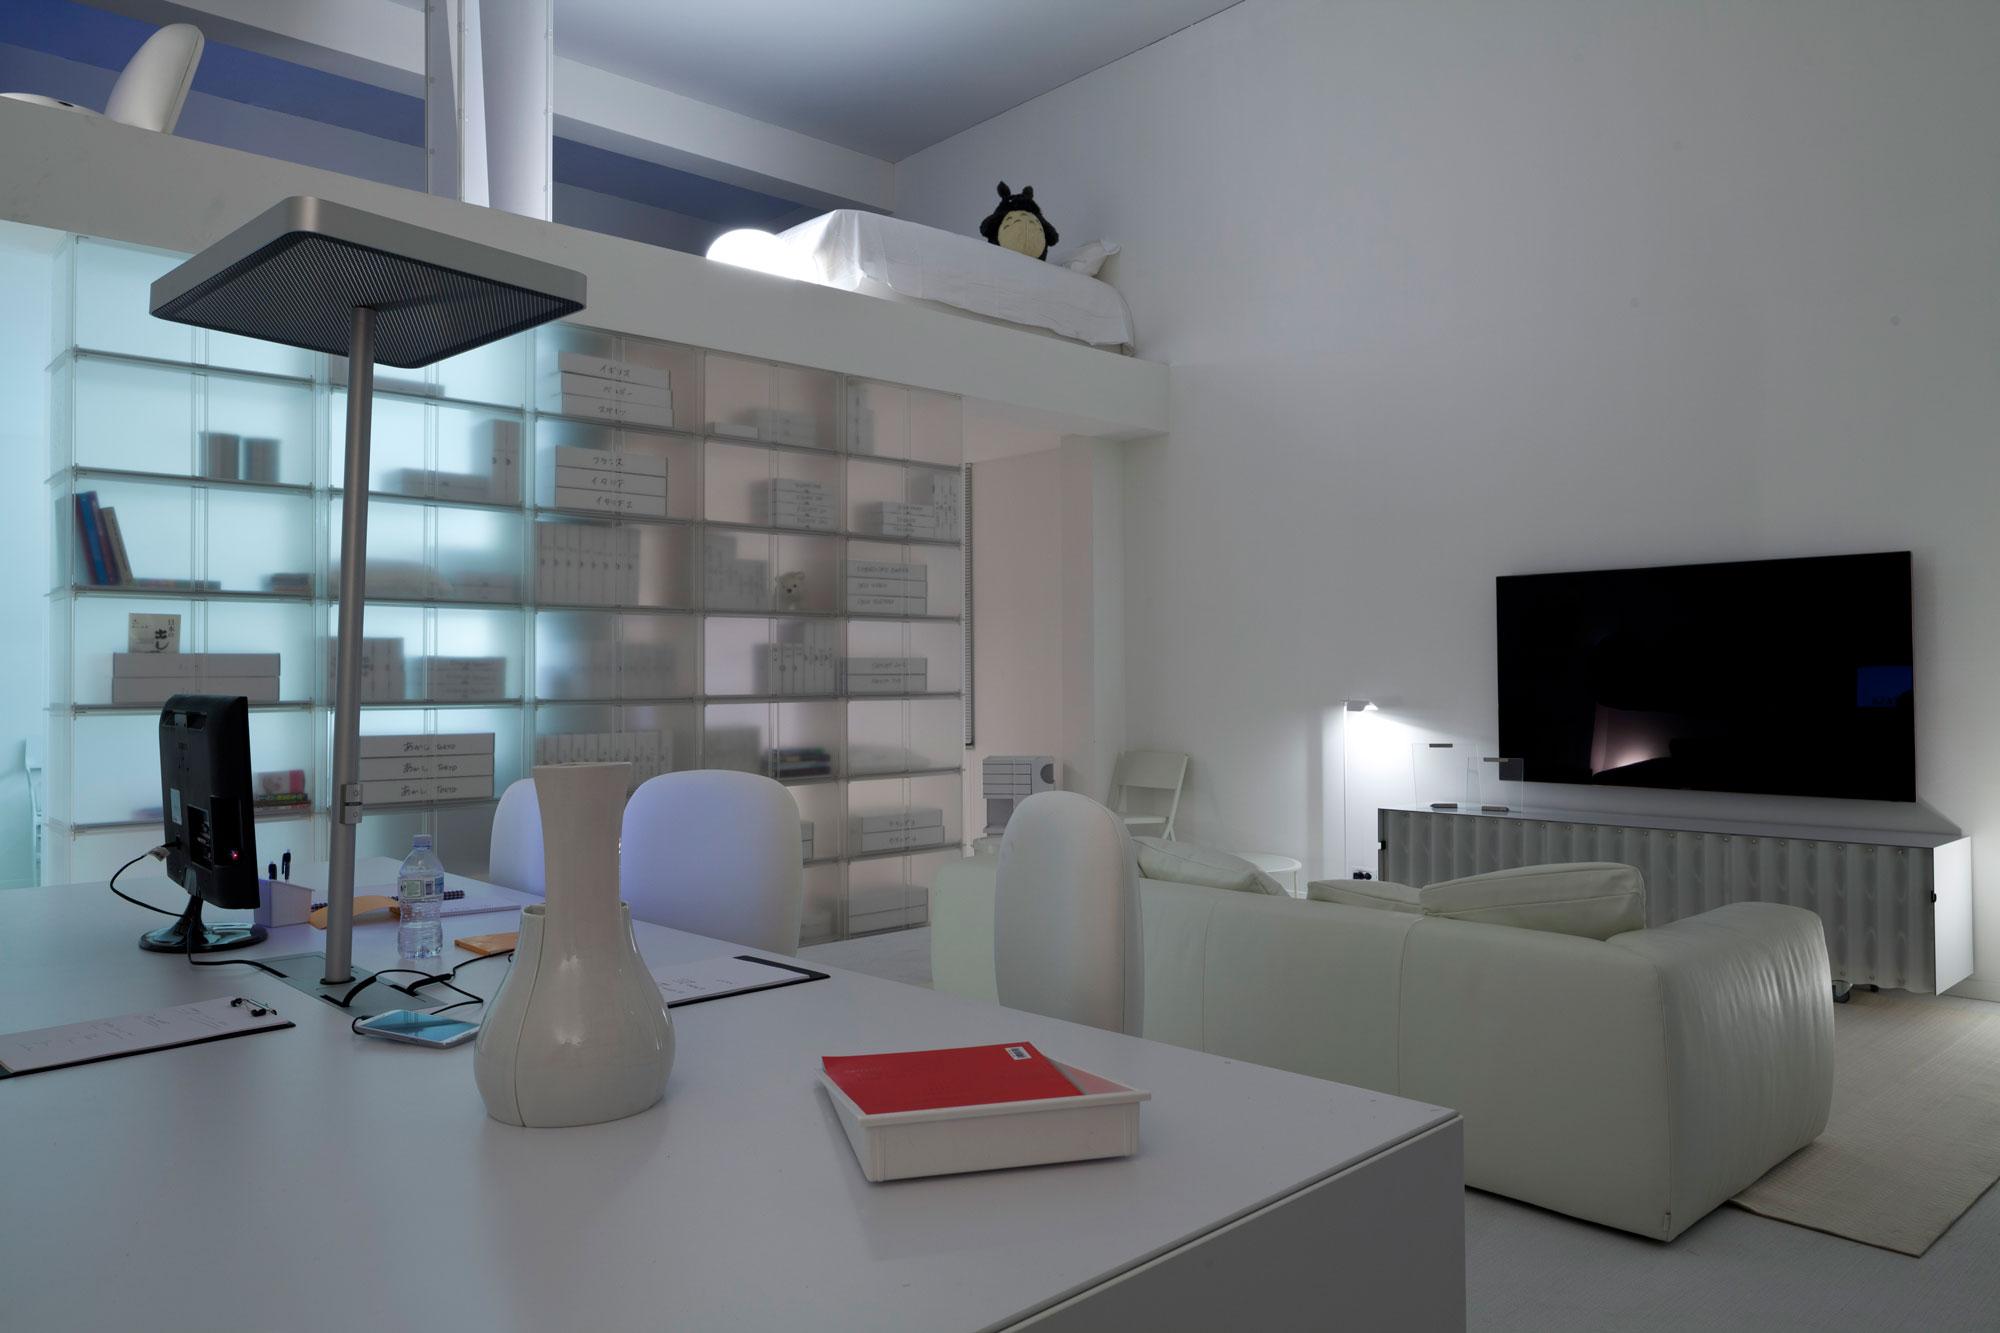 travailler chez soi jean nouvel design. Black Bedroom Furniture Sets. Home Design Ideas